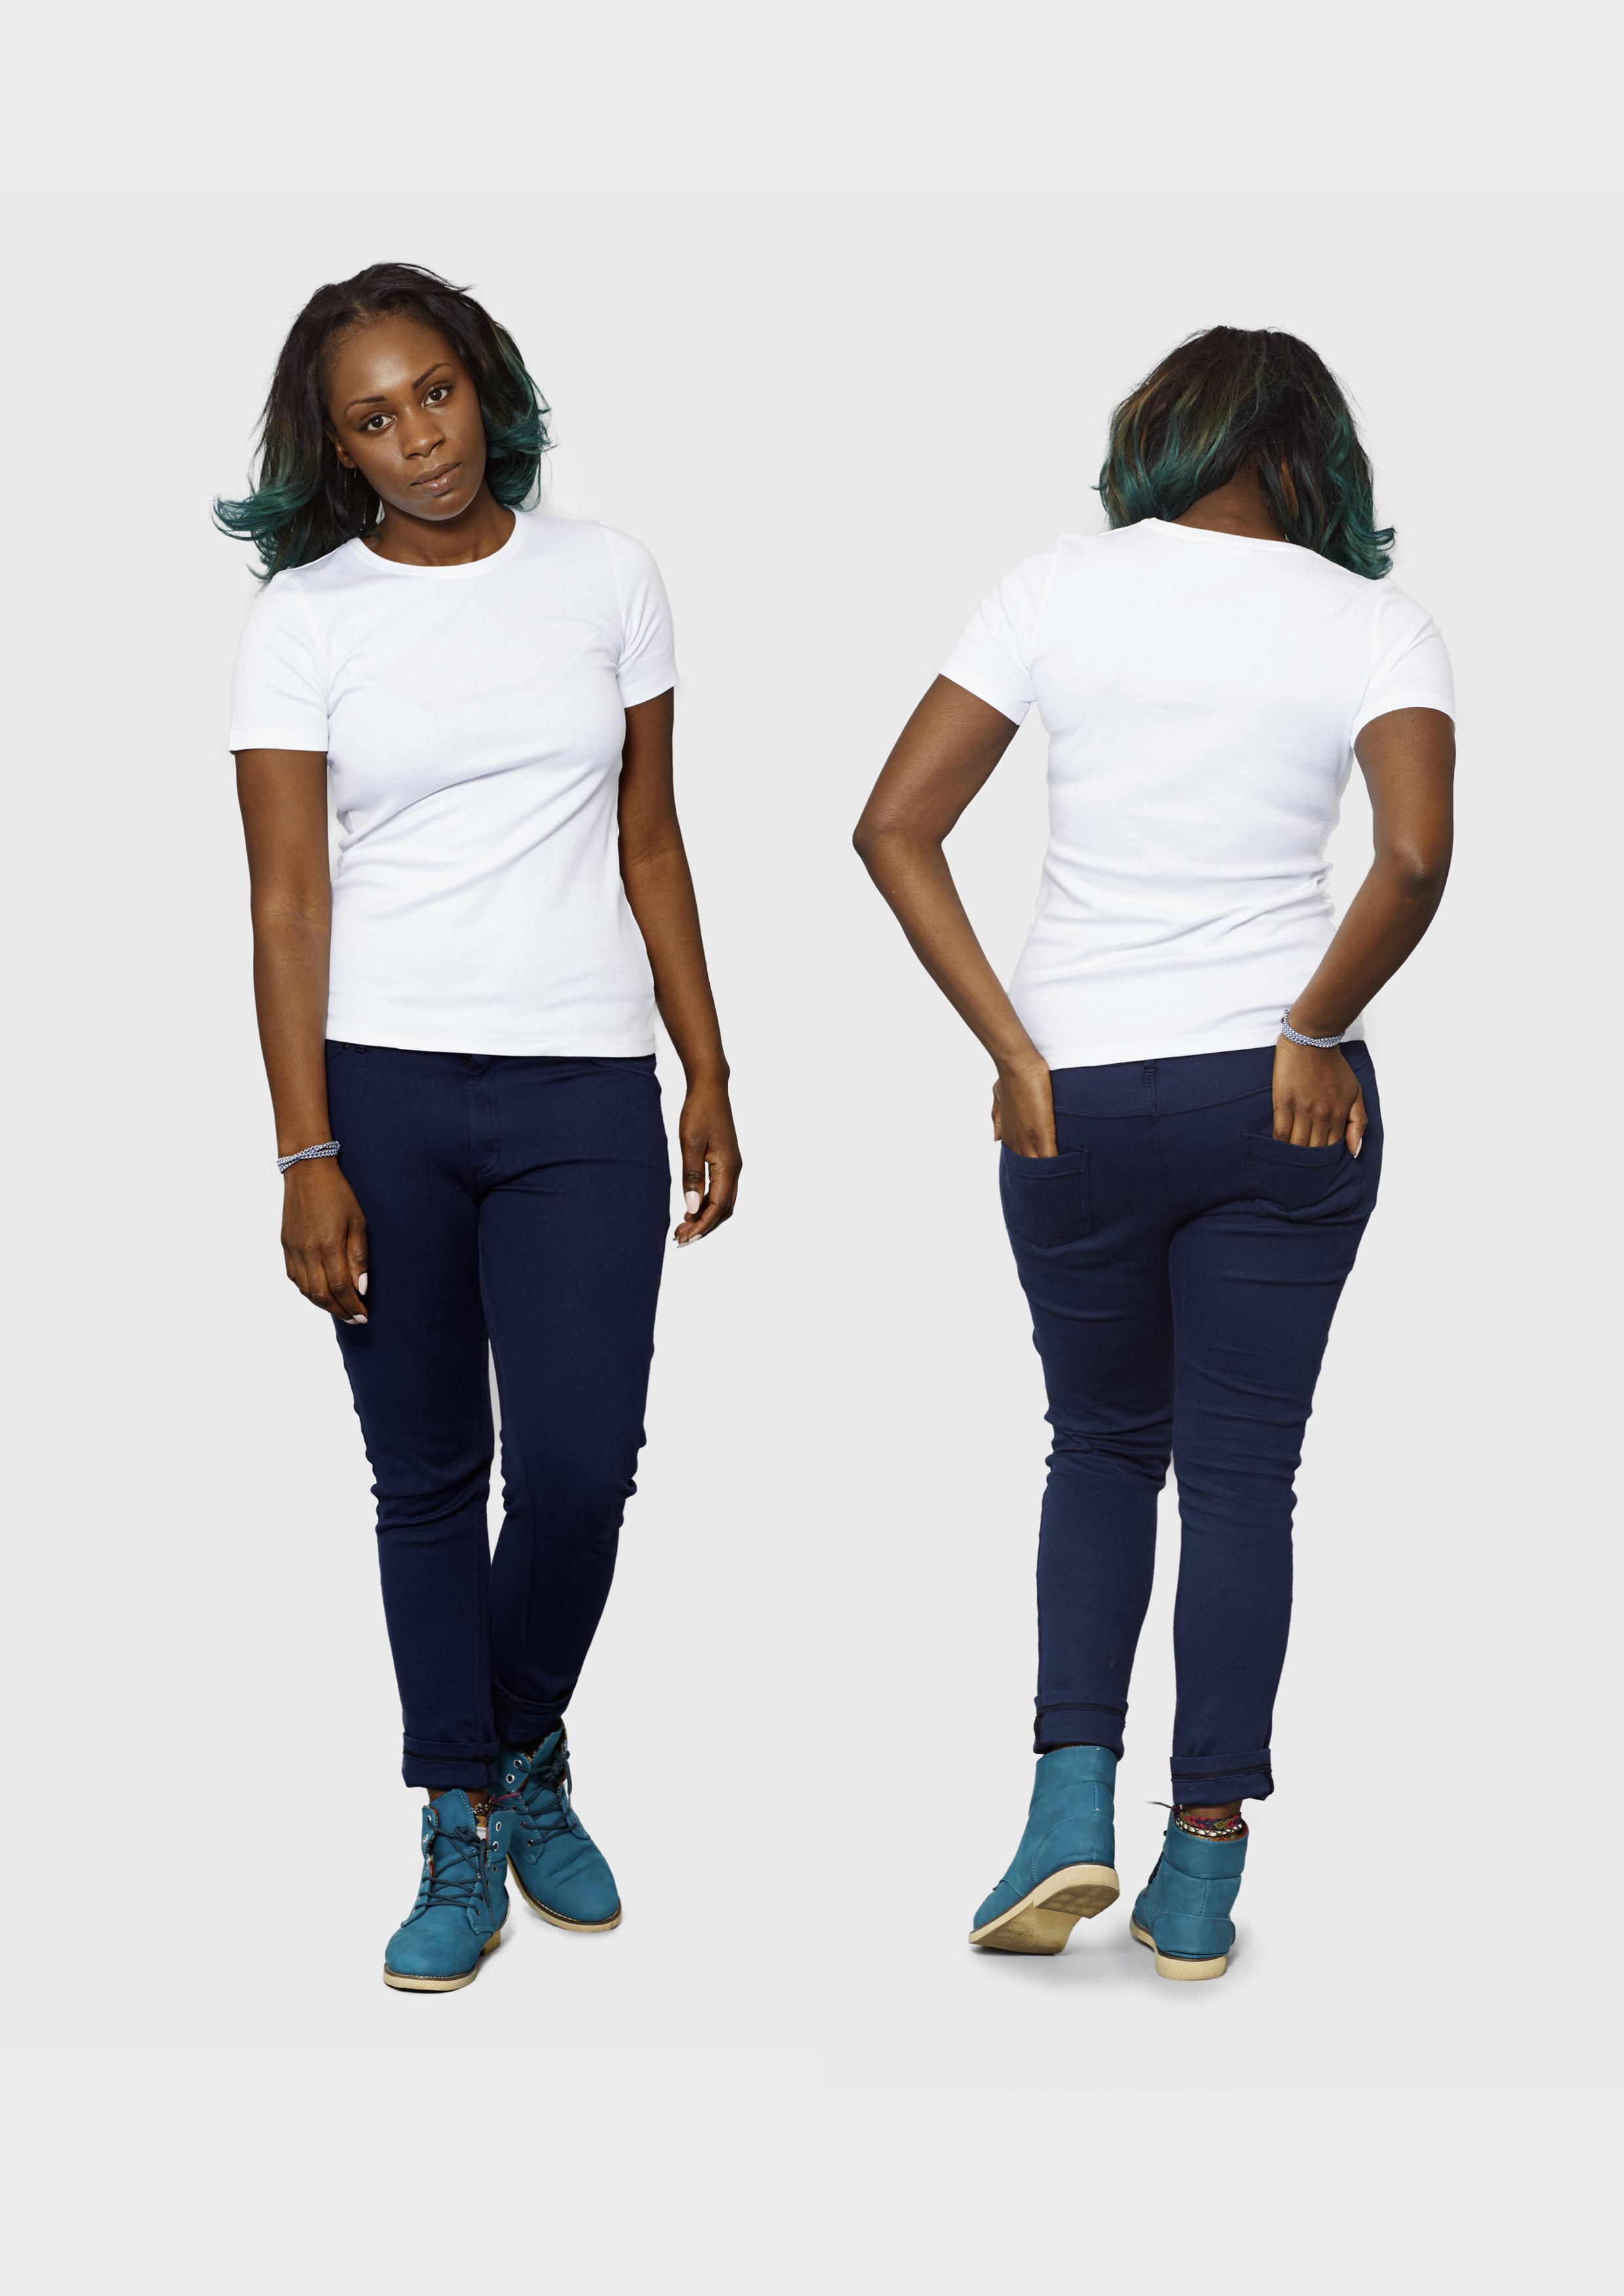 White t shirt company - The White T Shirt Co